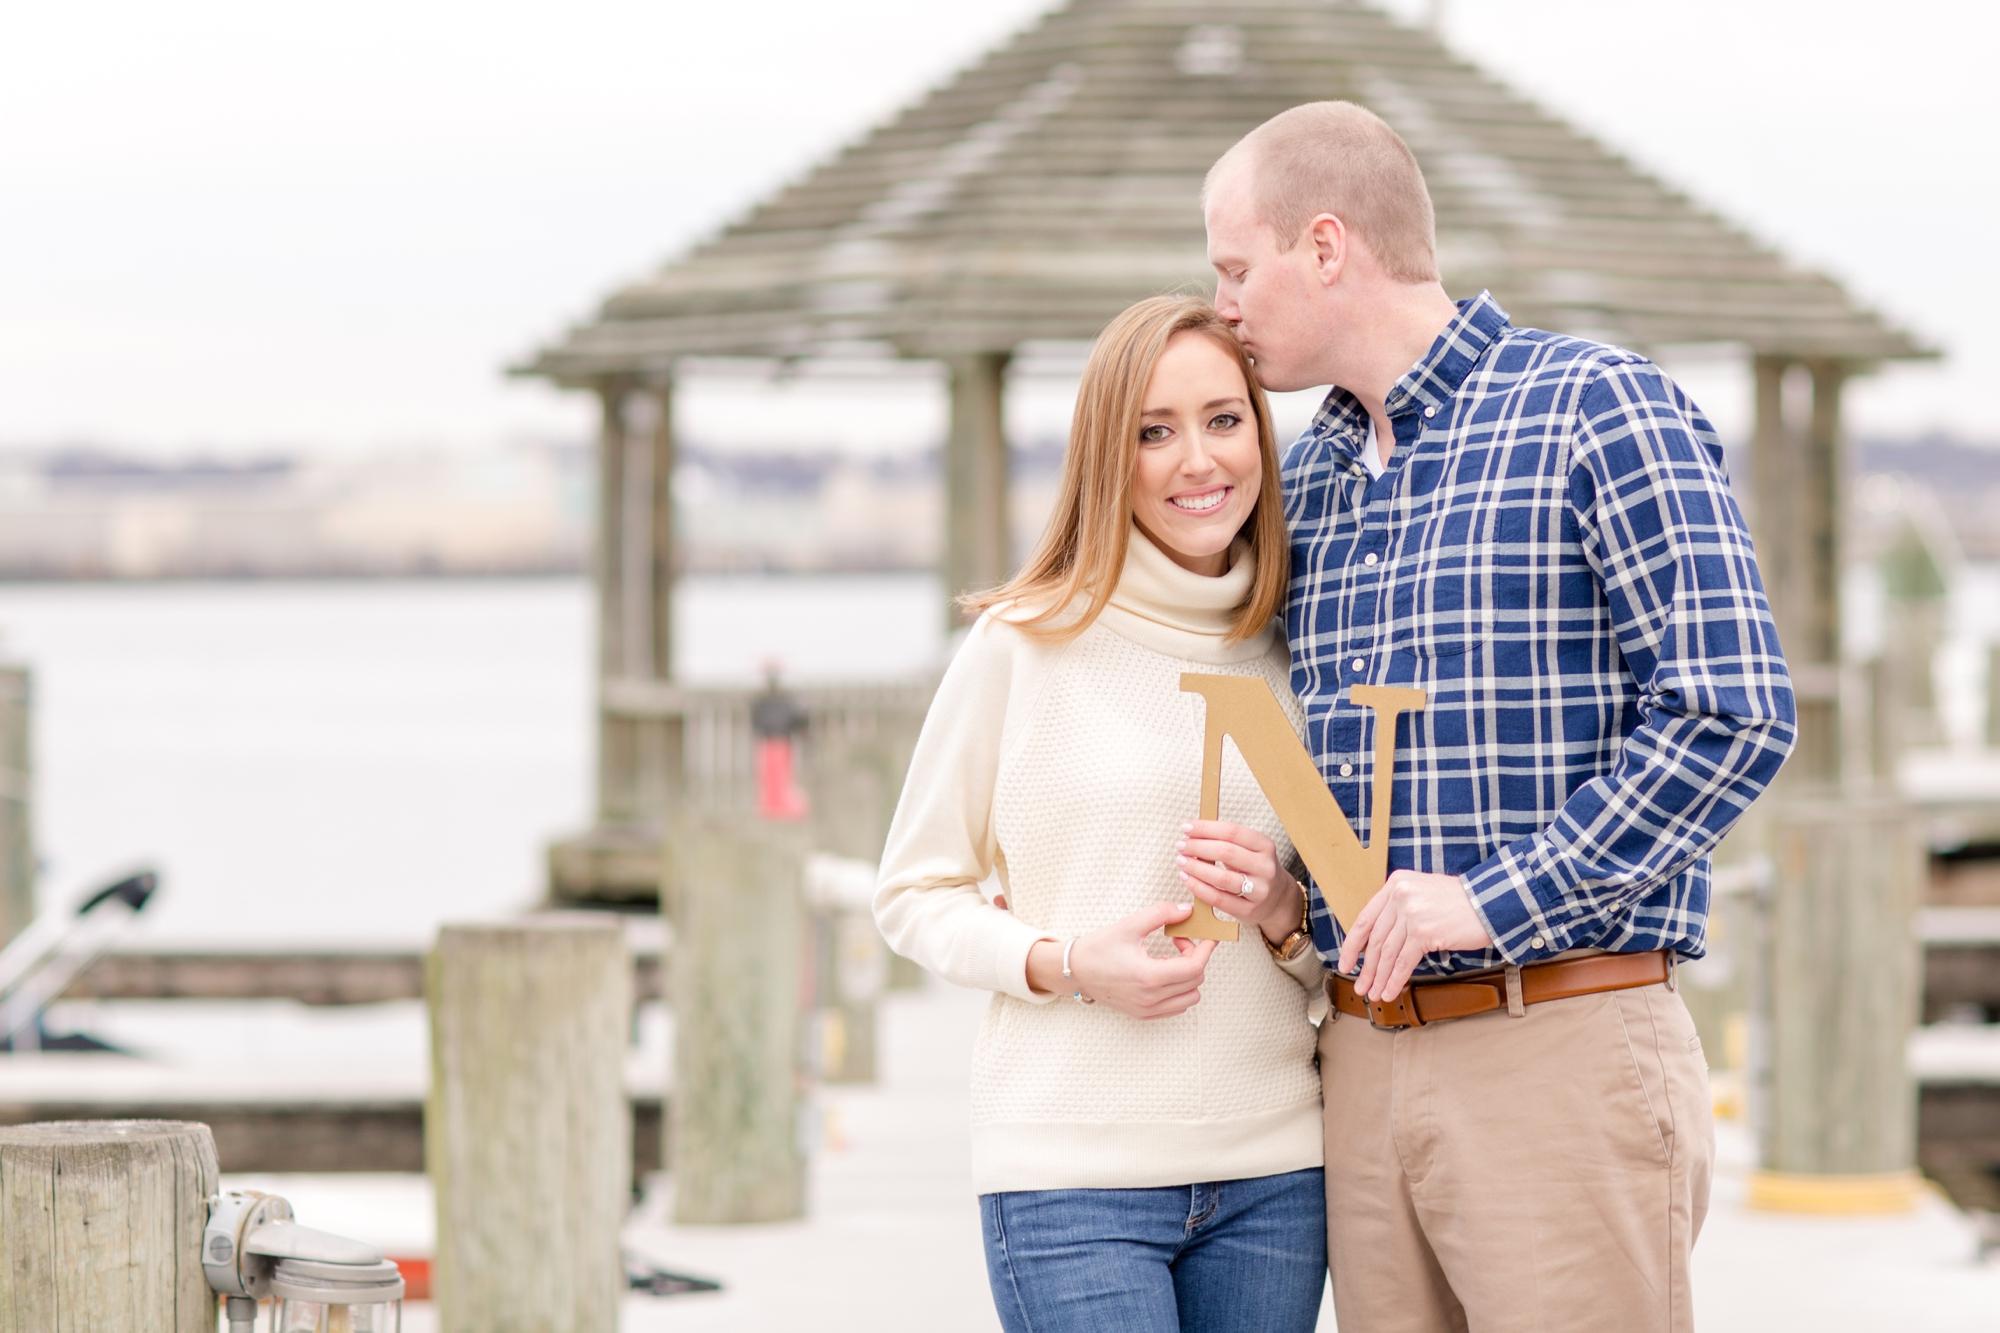 Kristin & Matt Engagement-202_anna grace photography old town alexandria virginia engagement and wedding photographer photo.jpg